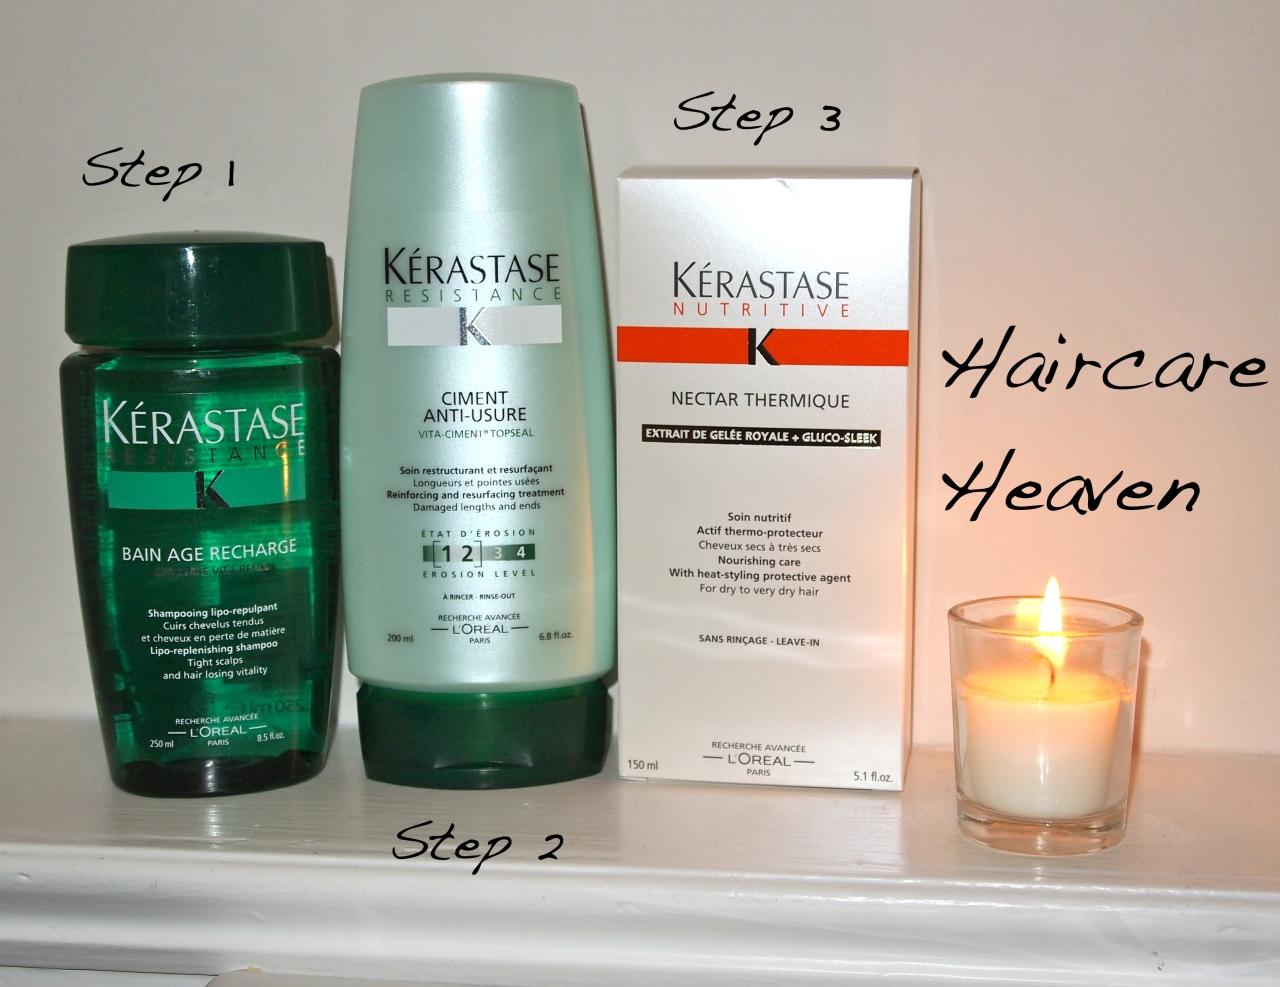 * kerastase age recharge shampoo £15.90, kerastase ciment anti-usure conditioner £18.90, kerastase nectar thermique £18.90 *